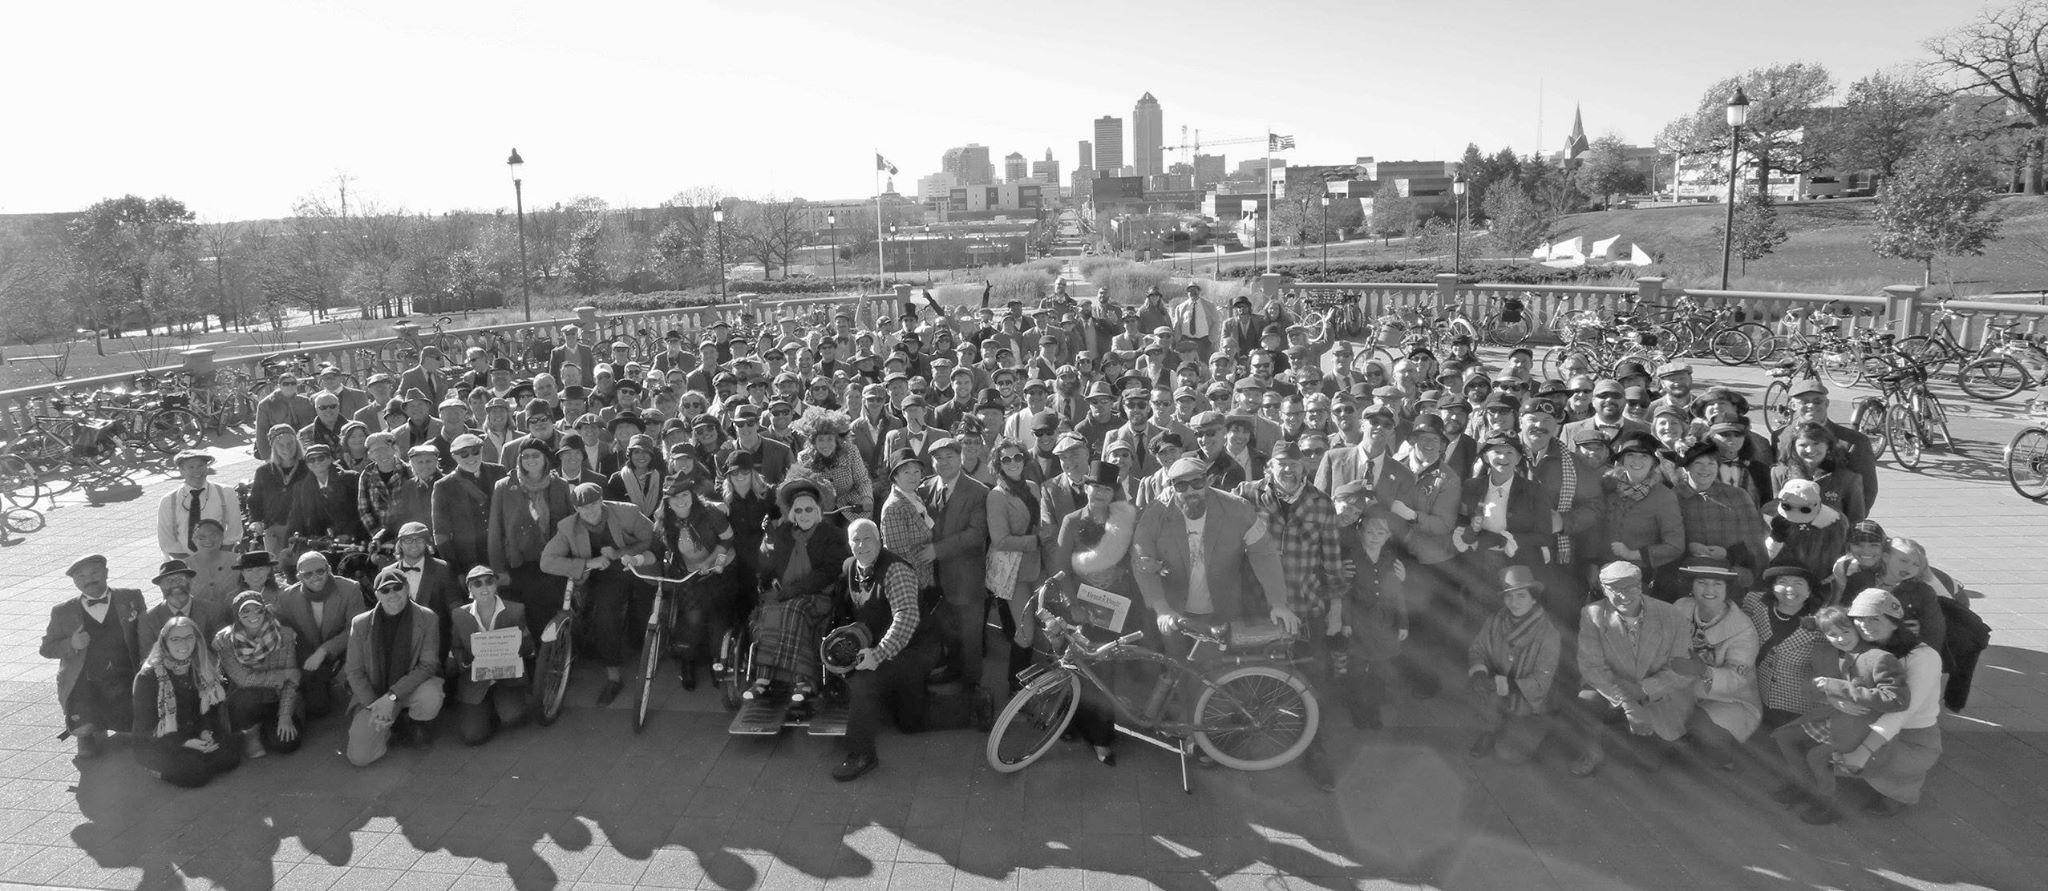 Tweed Ride 2015 State Capital BW